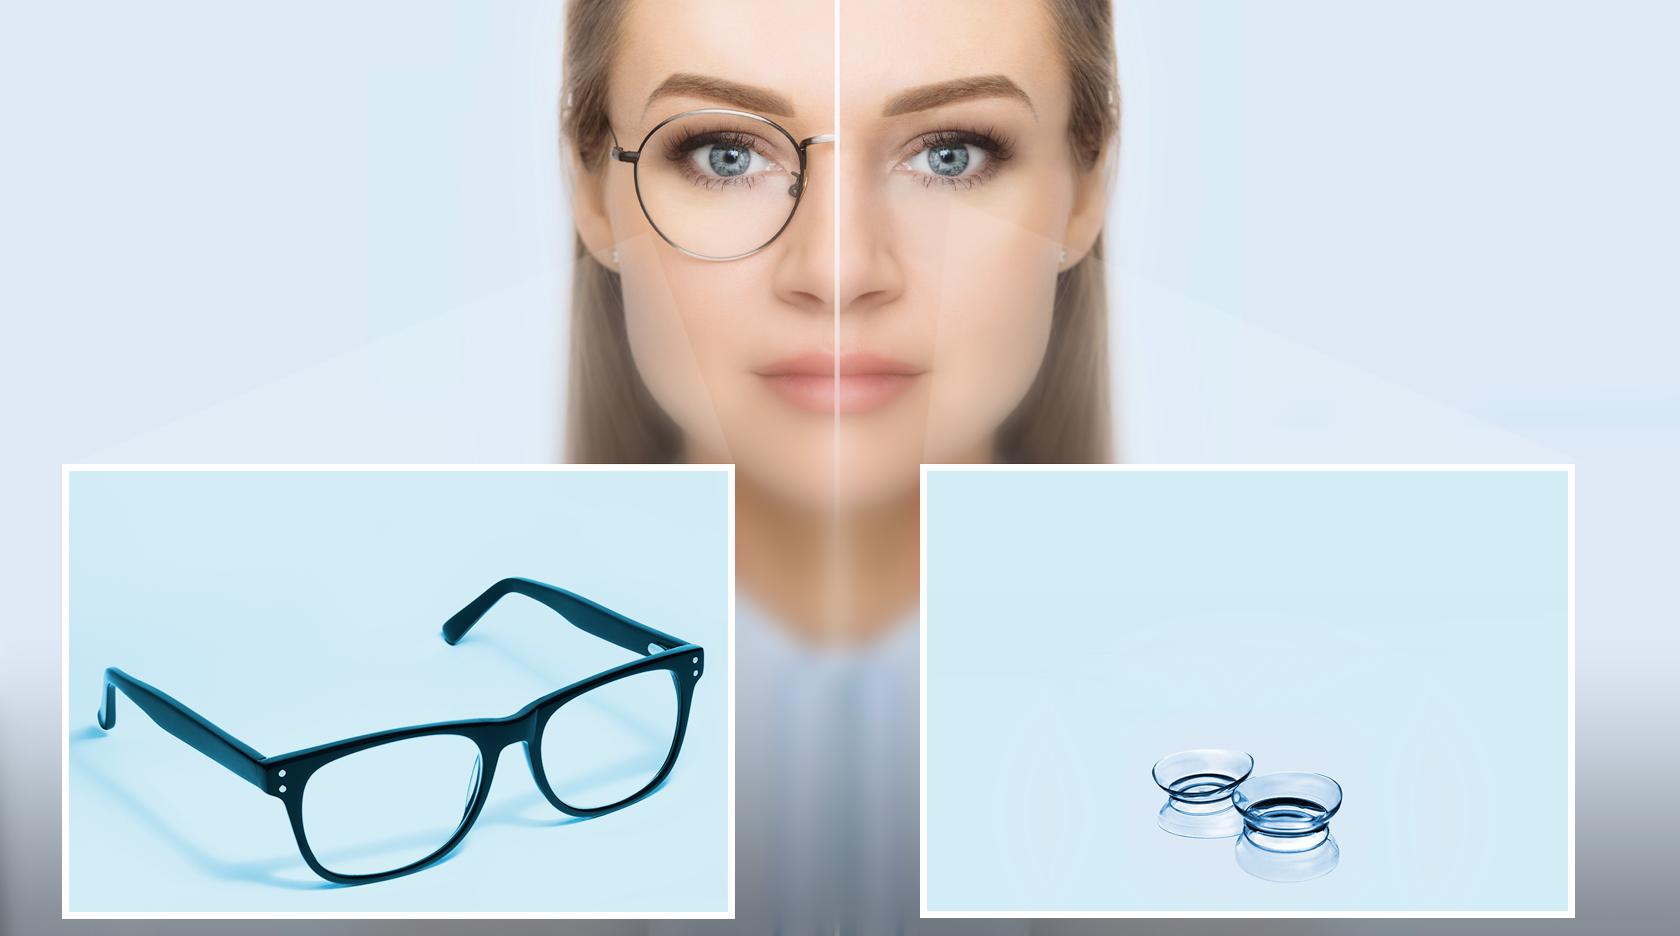 glasses vs contacts